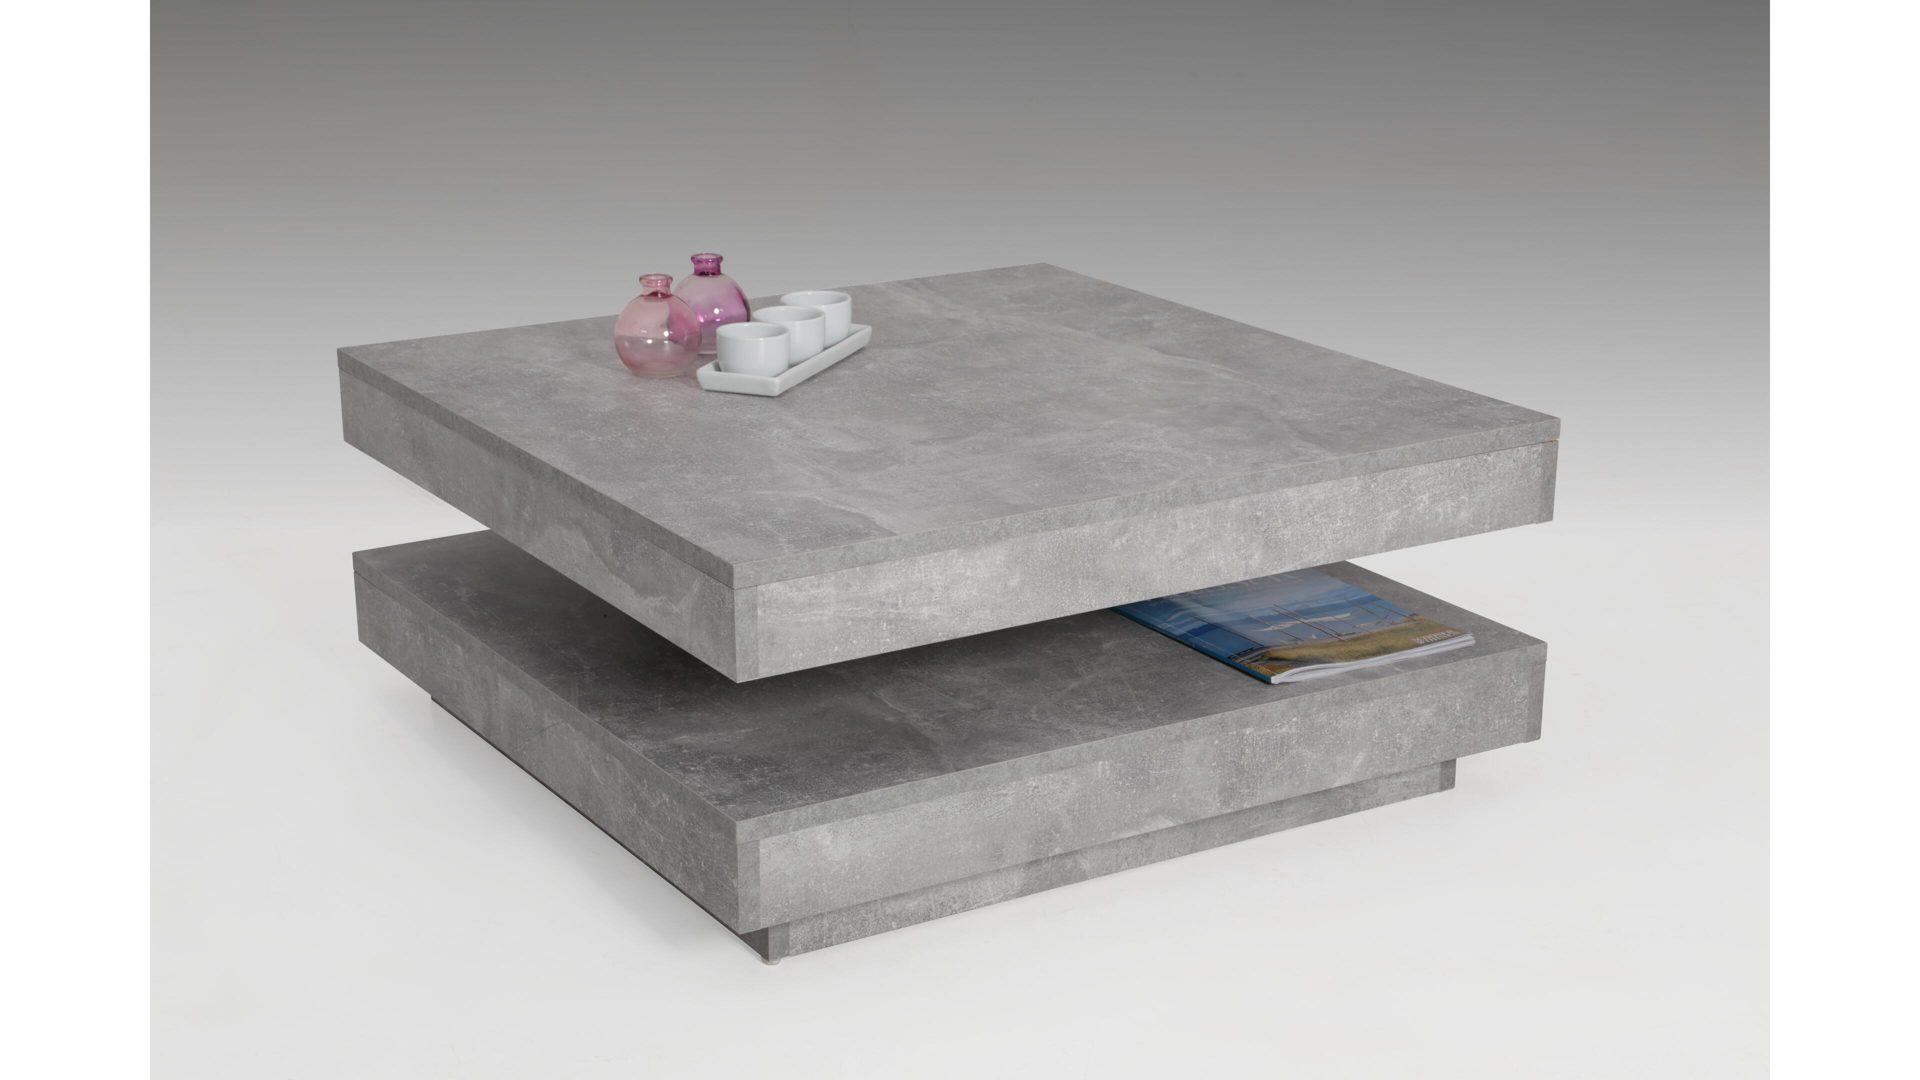 Funktions-Couchtisch, betonfarbene Kunststoffoberflächen – ca. 78 x 78 cm